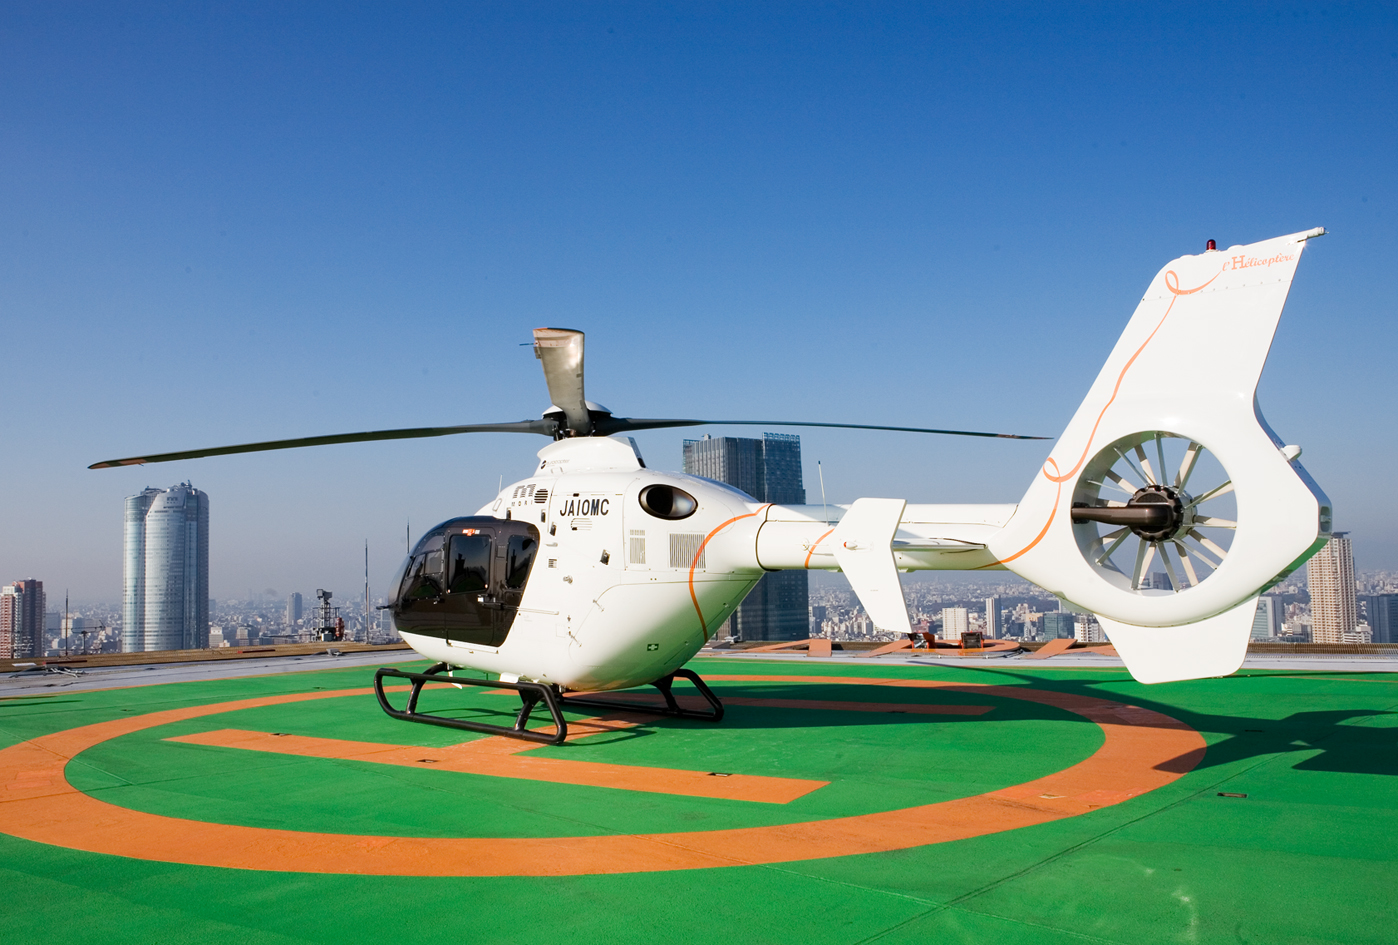 Площадка для вертолётов в Токио